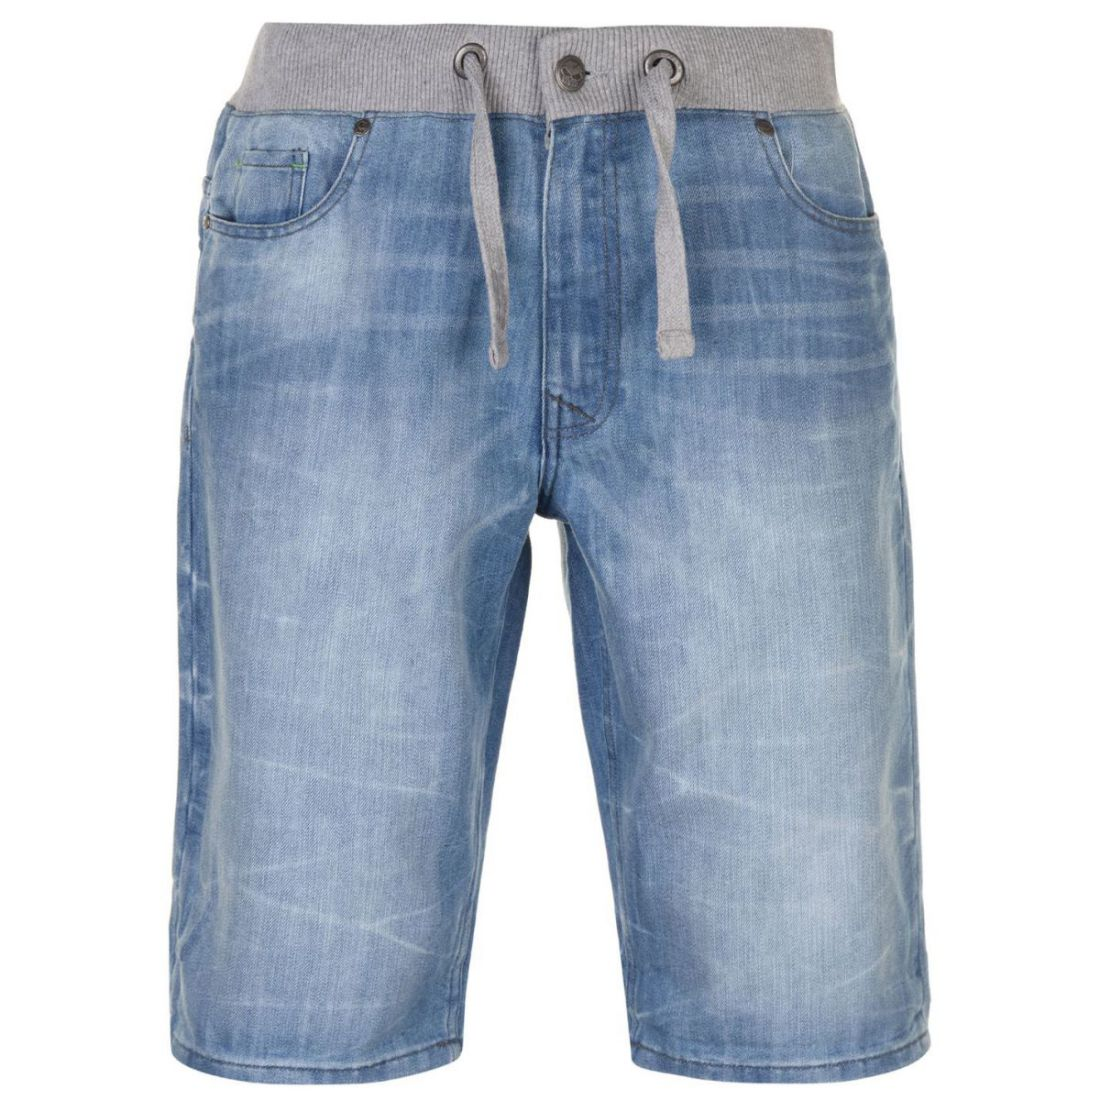 No-Fear-Mens-Denim-Shorts-Pants-Trousers-Bottoms-Zip-Warm-Drawstring-Elasticated thumbnail 6